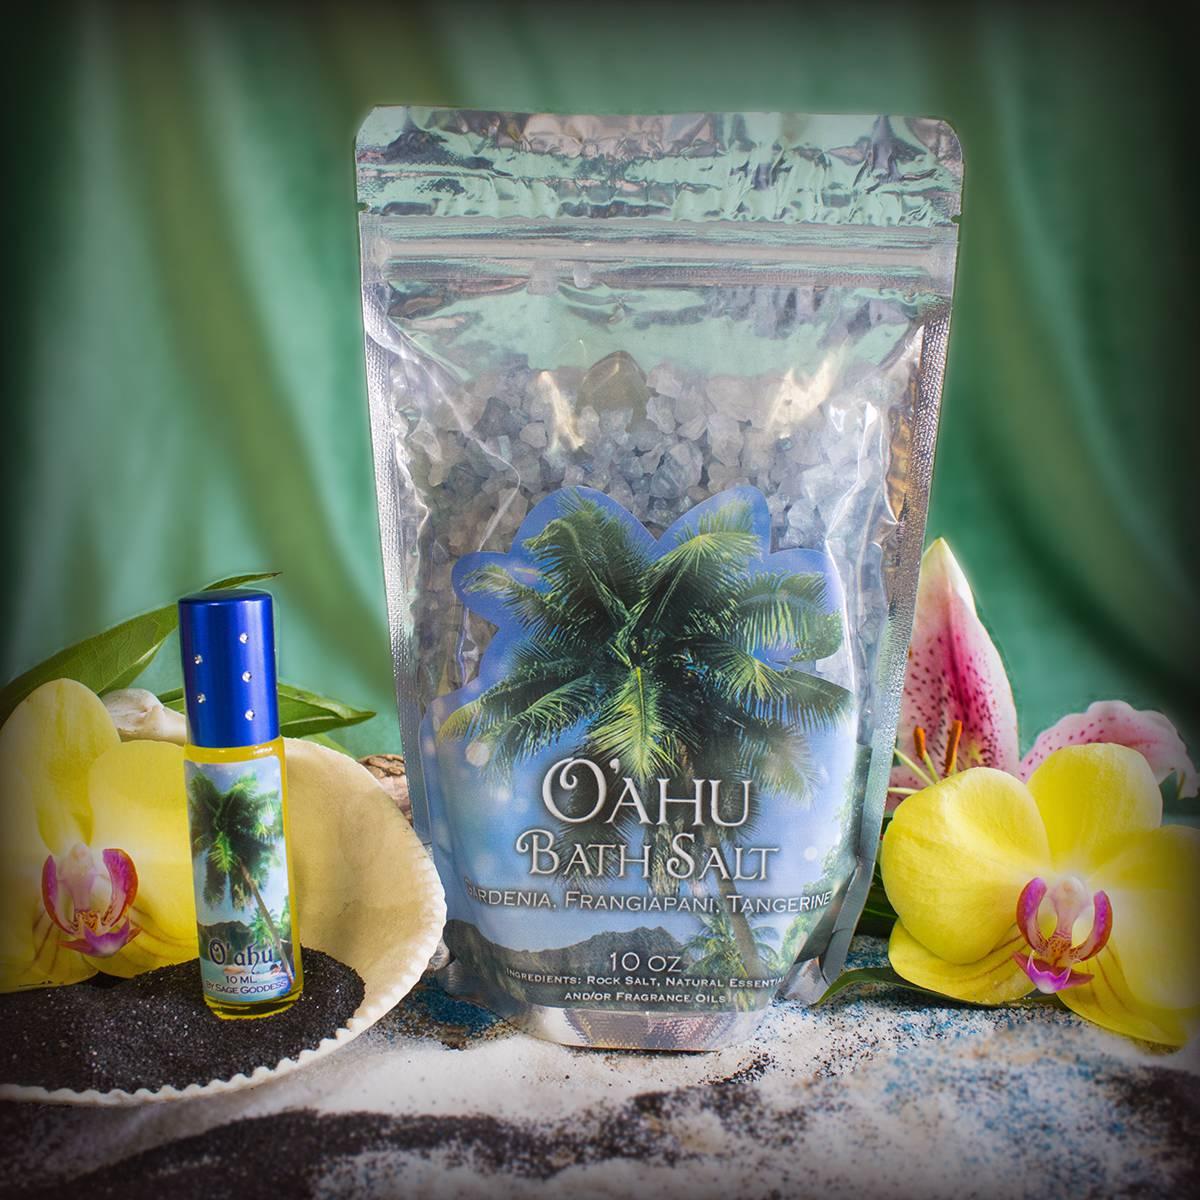 Oahu island magic duo for the romance and beauty of the hawaiian hawaiian islands 1100 izmirmasajfo